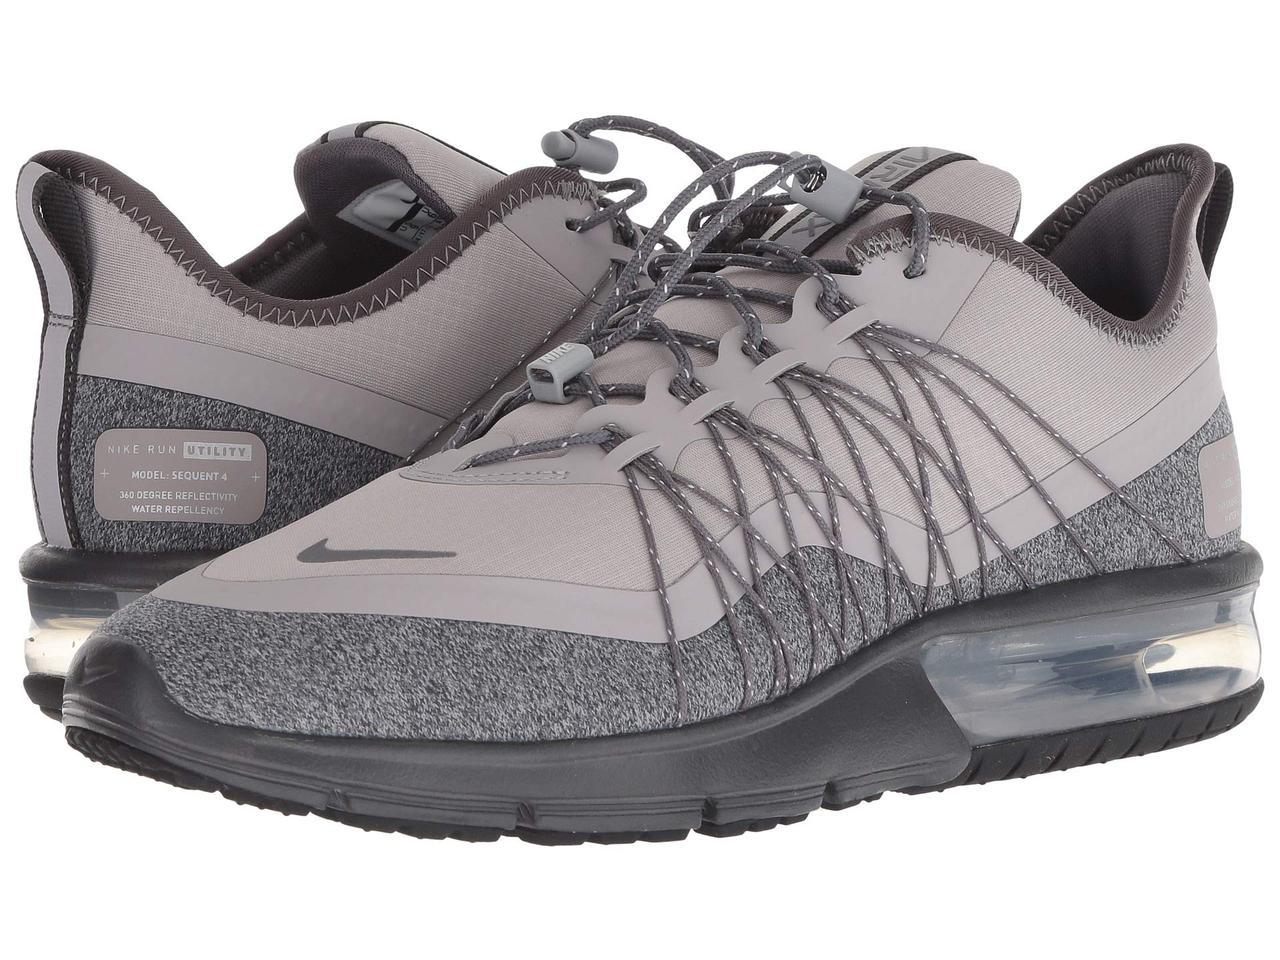 super popular 6ab31 20214 Кроссовки Кеды (Оригинал) Nike Air Max Sequent 4 Shield Atmosphere  Grey Metallic